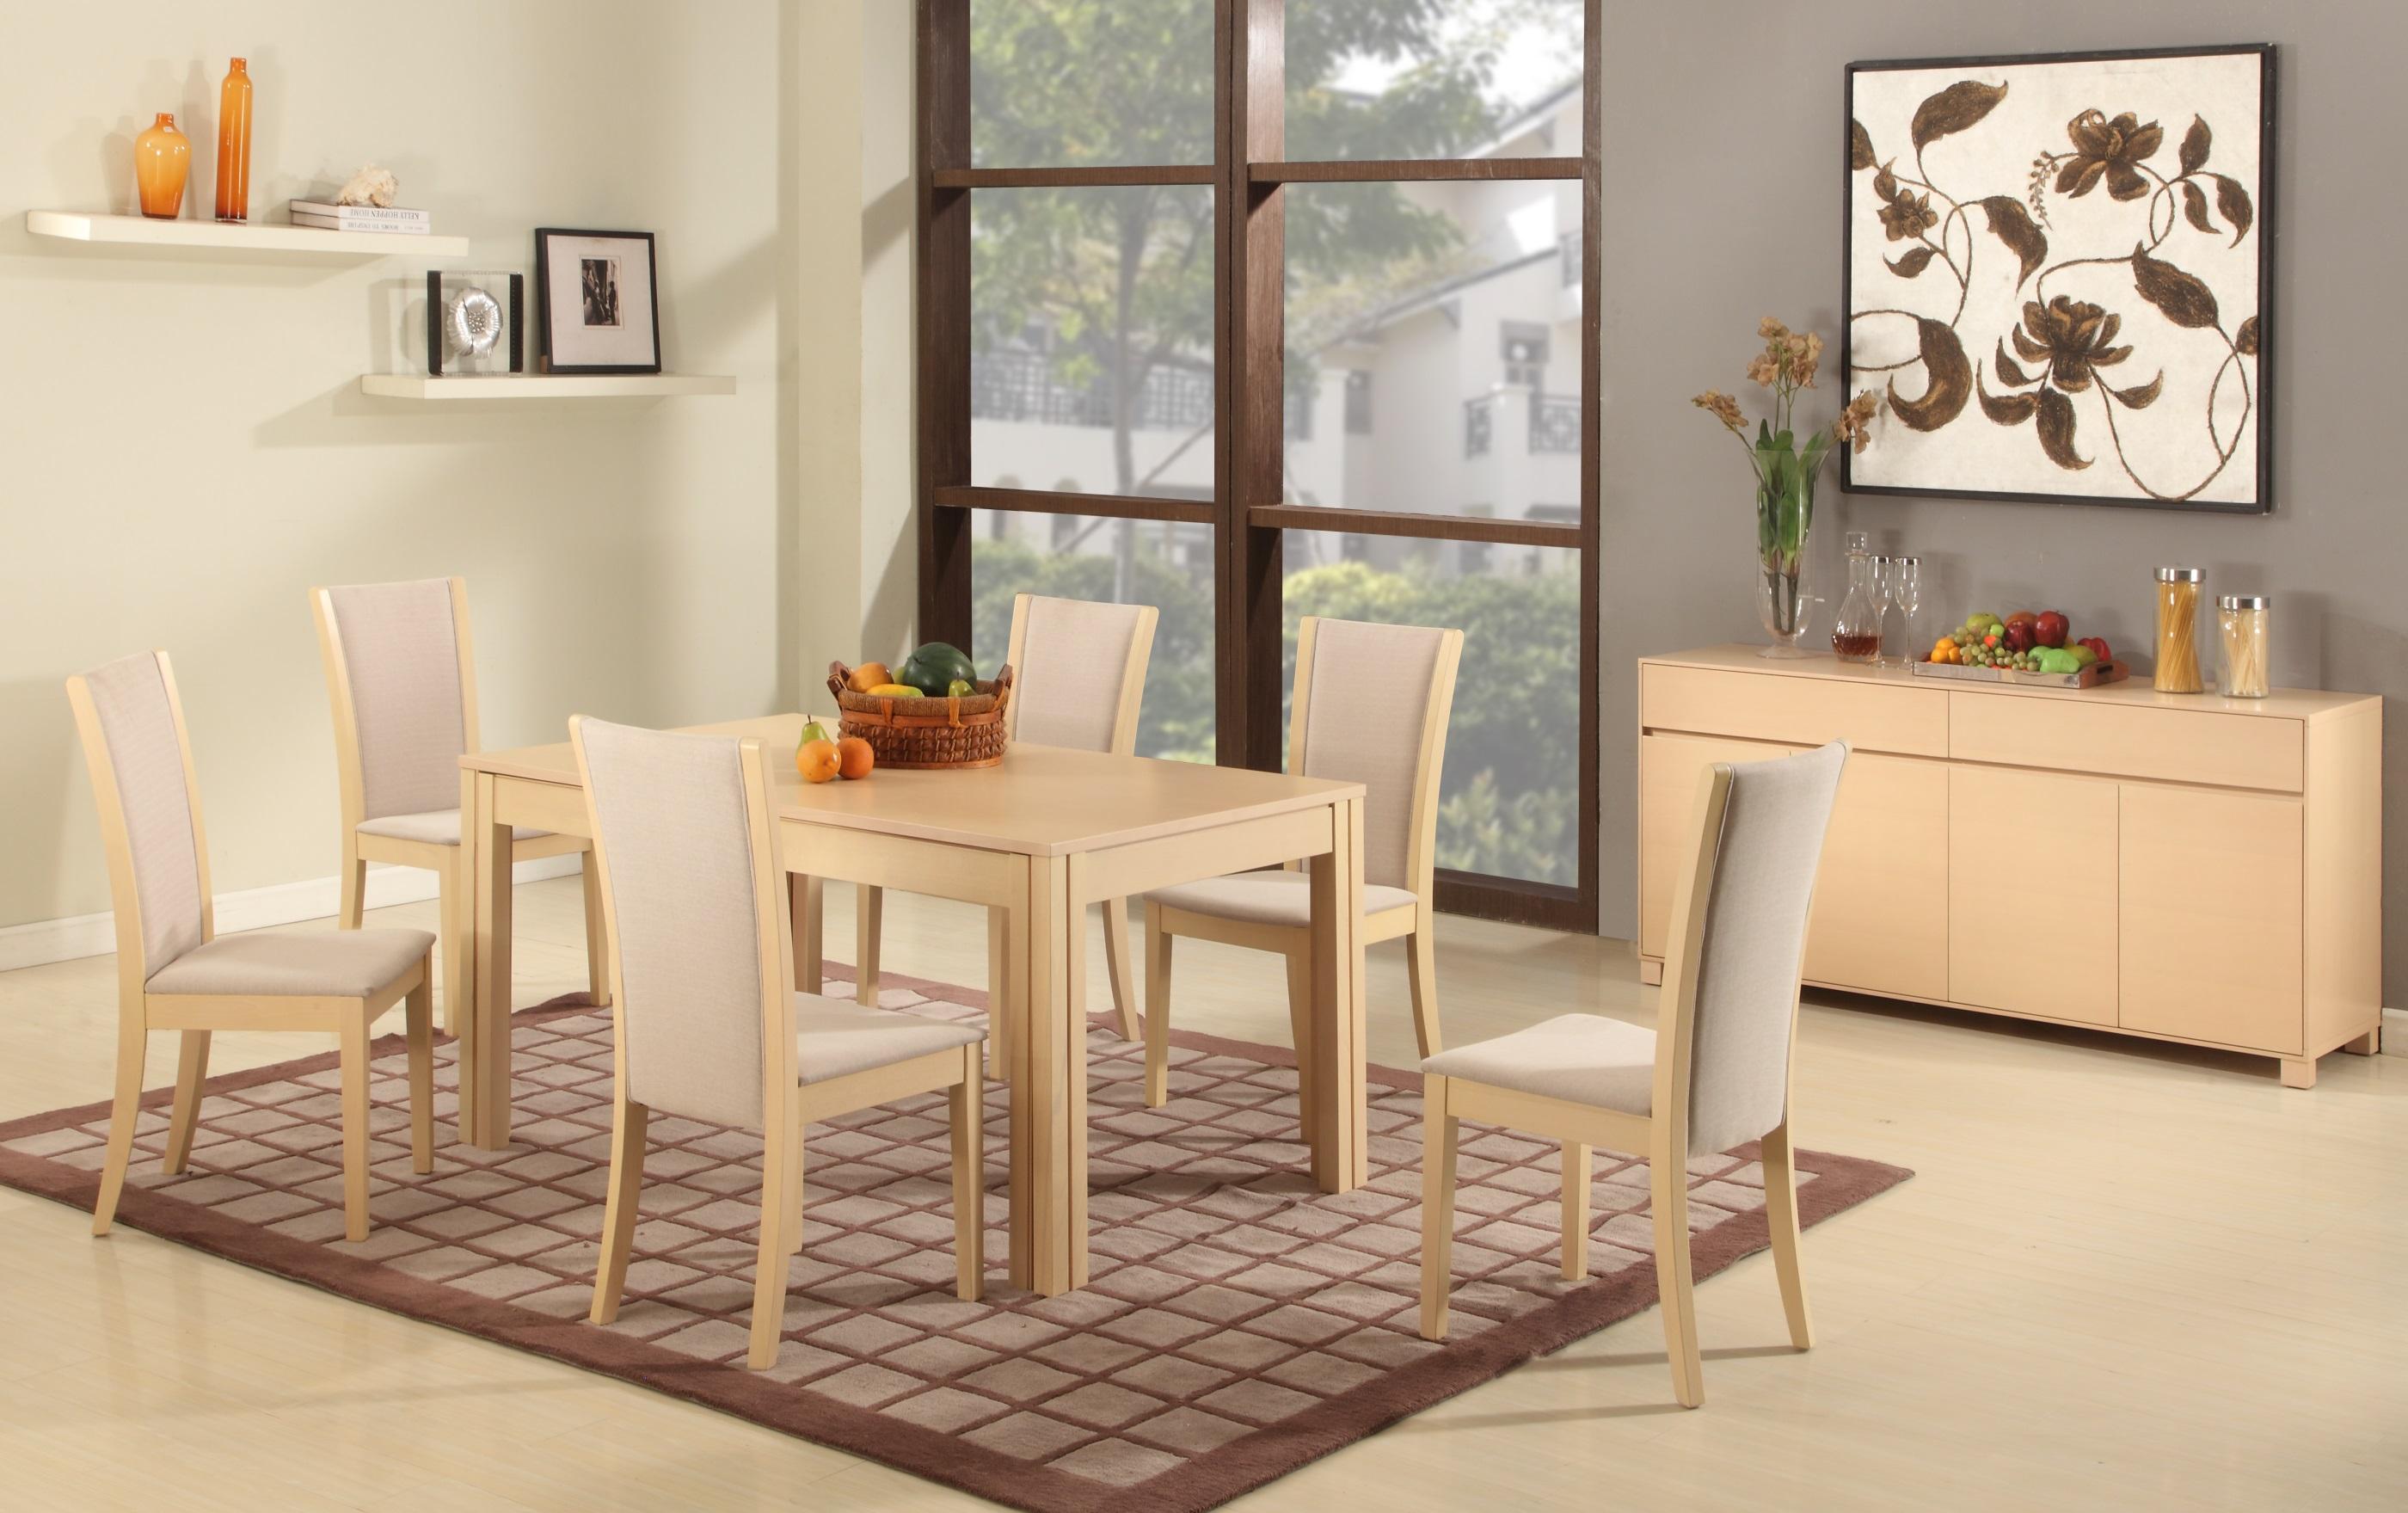 Extendable Rectangular Wooden And Fabric Seats Designer